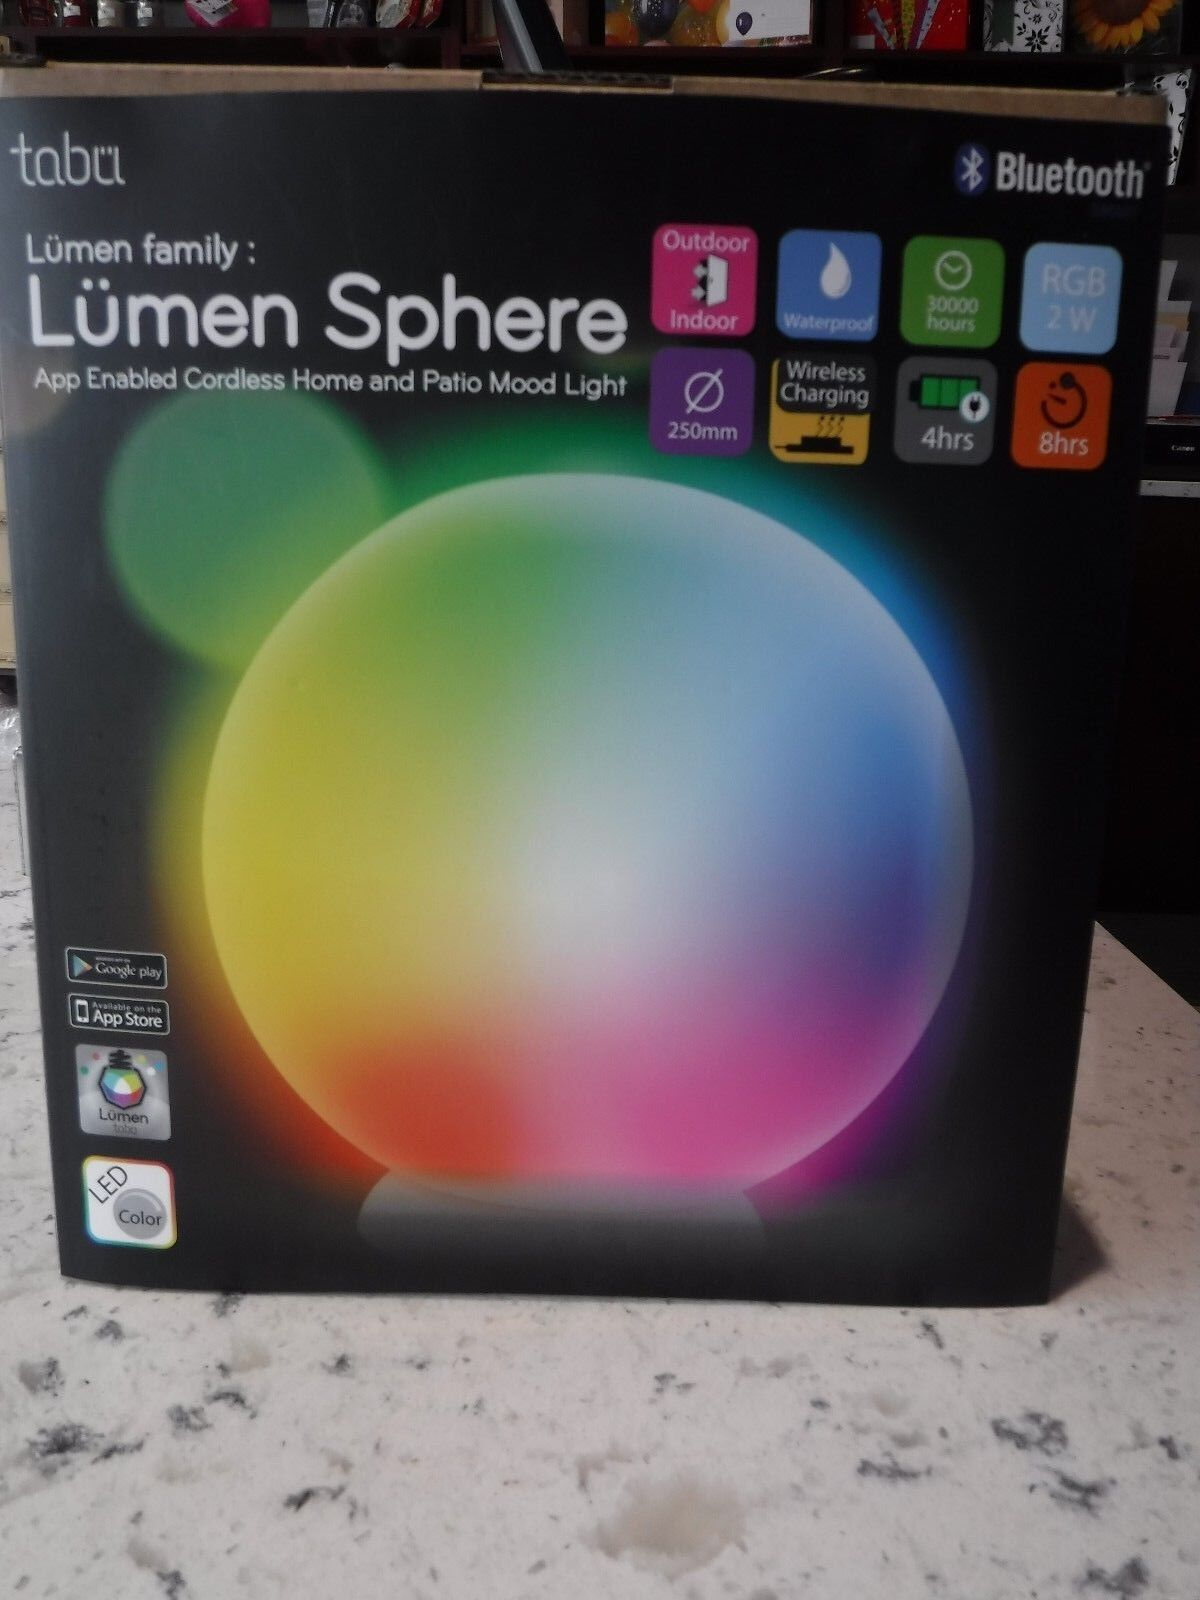 Lumen By Tabu Mood Light Light Light Sphere TL-700 Blautooth Smart Cordless Outdoor Indoor da218b